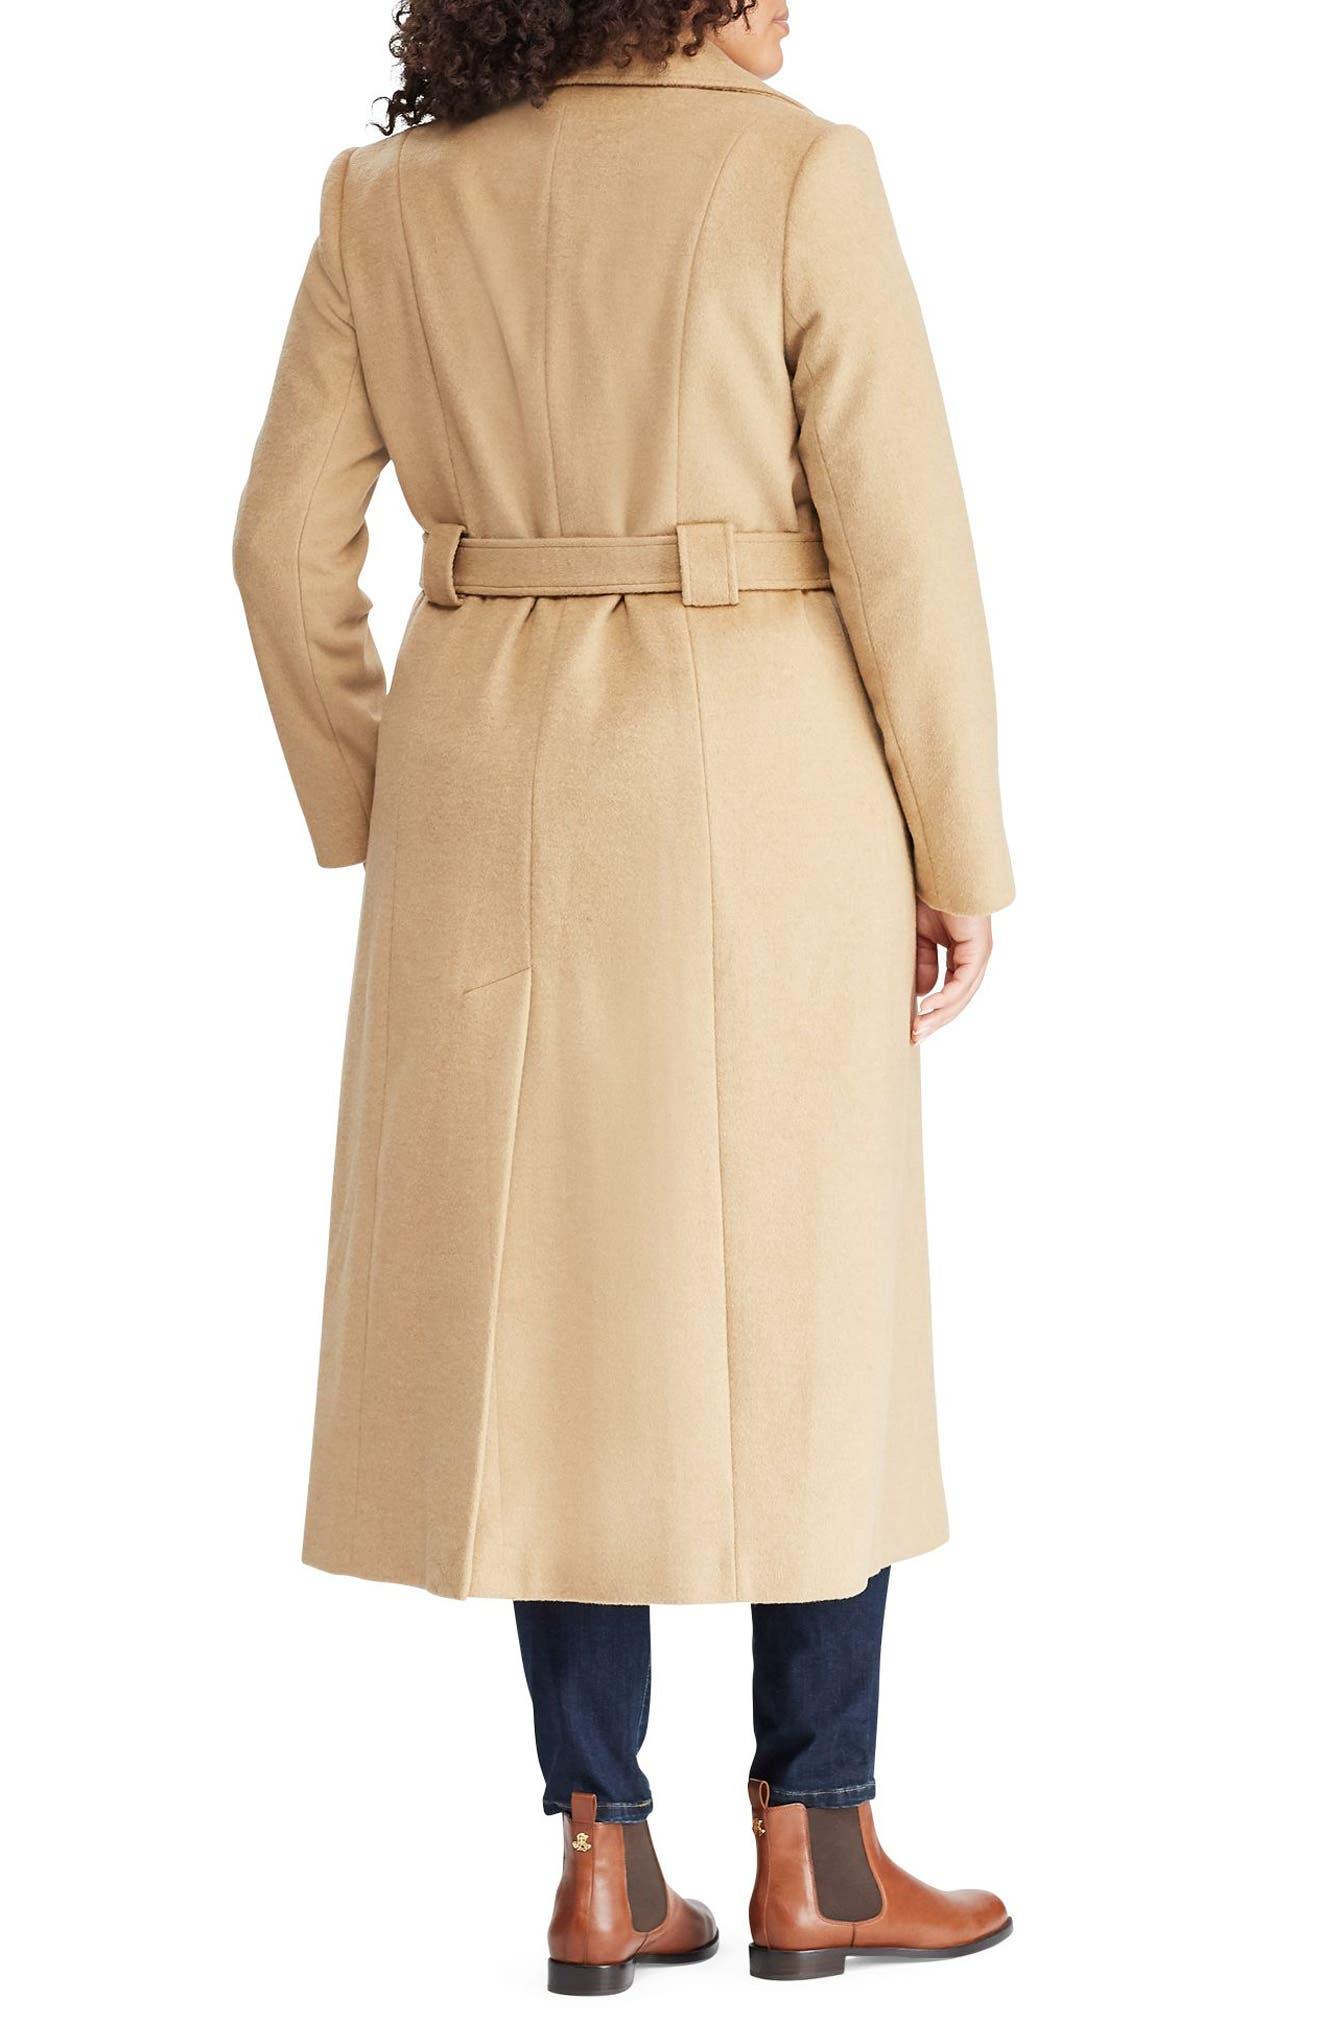 LAUREN RALPH LAUREN,                             Wool Blend Belted Wrap Coat,                             Alternate thumbnail 2, color,                             CAMEL